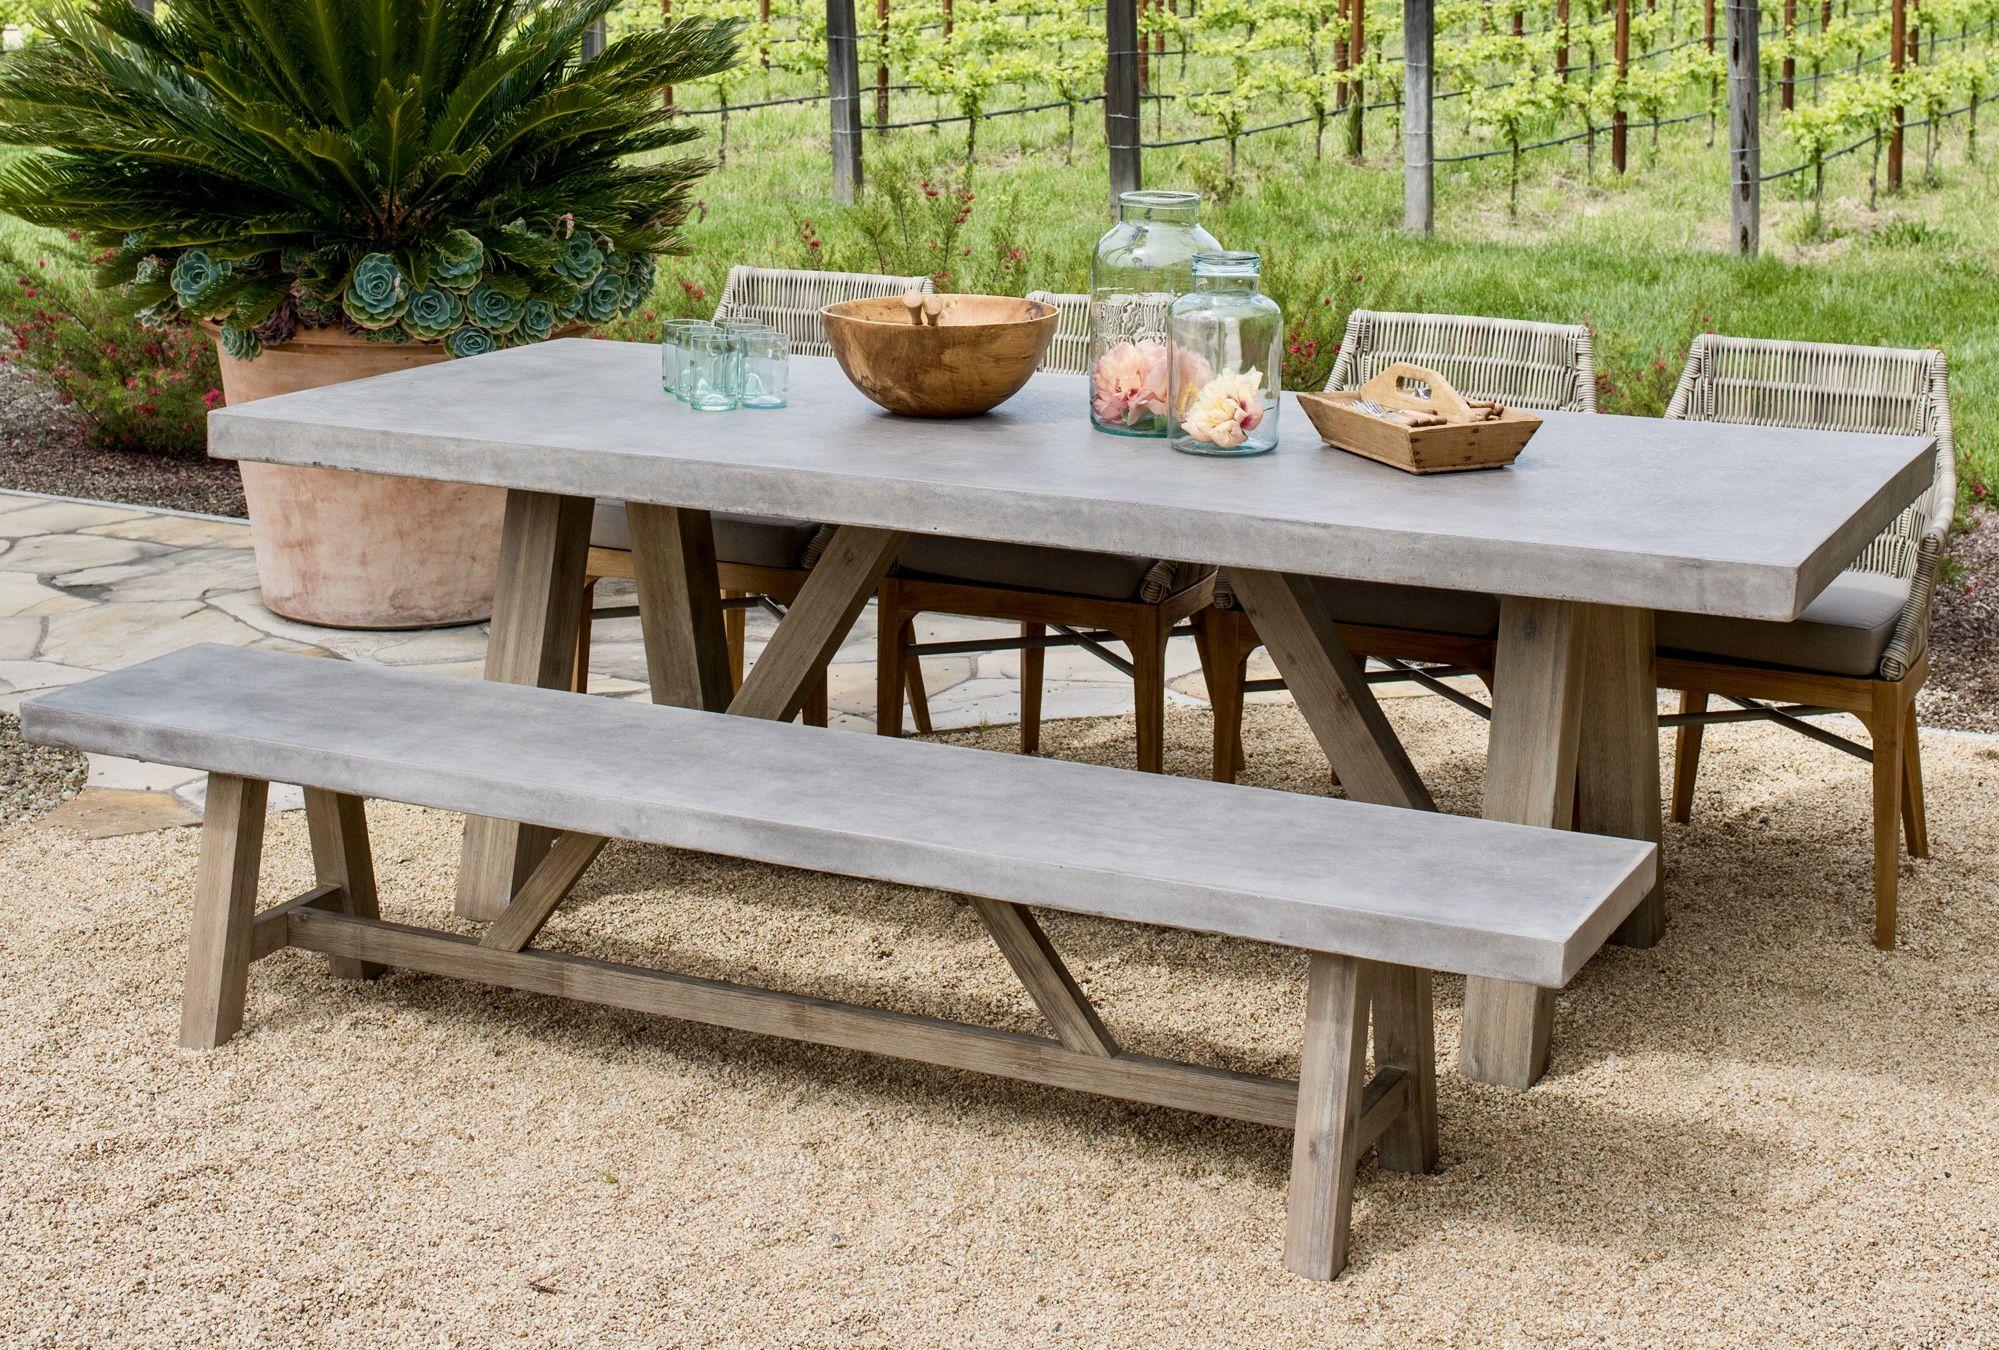 Bordeaux Concrete Top Table Outdoor Furniture Rustic Outdoor